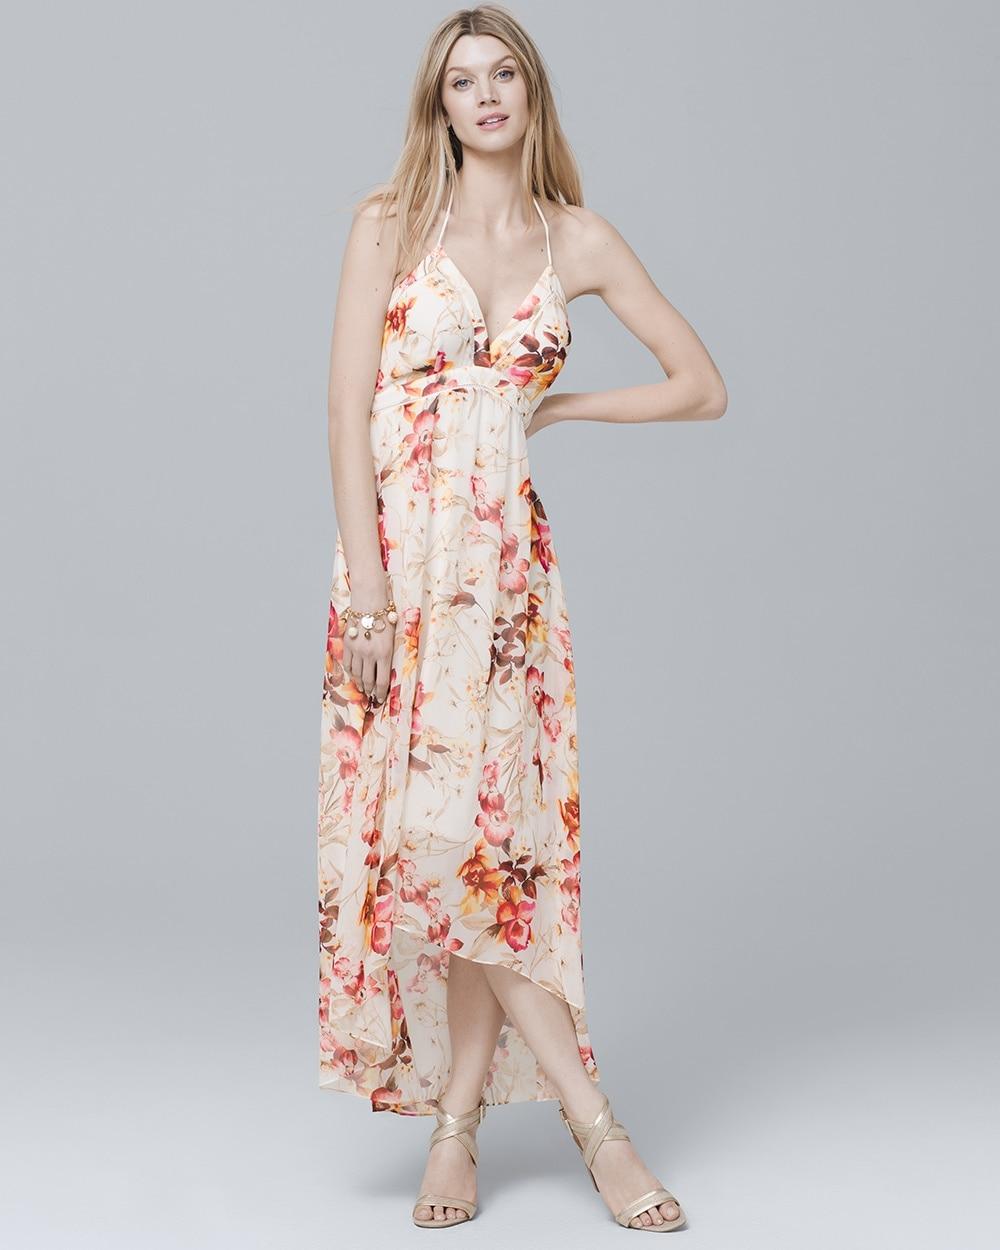 971512ce72a8b Halter Floral High-Low Maxi Dress